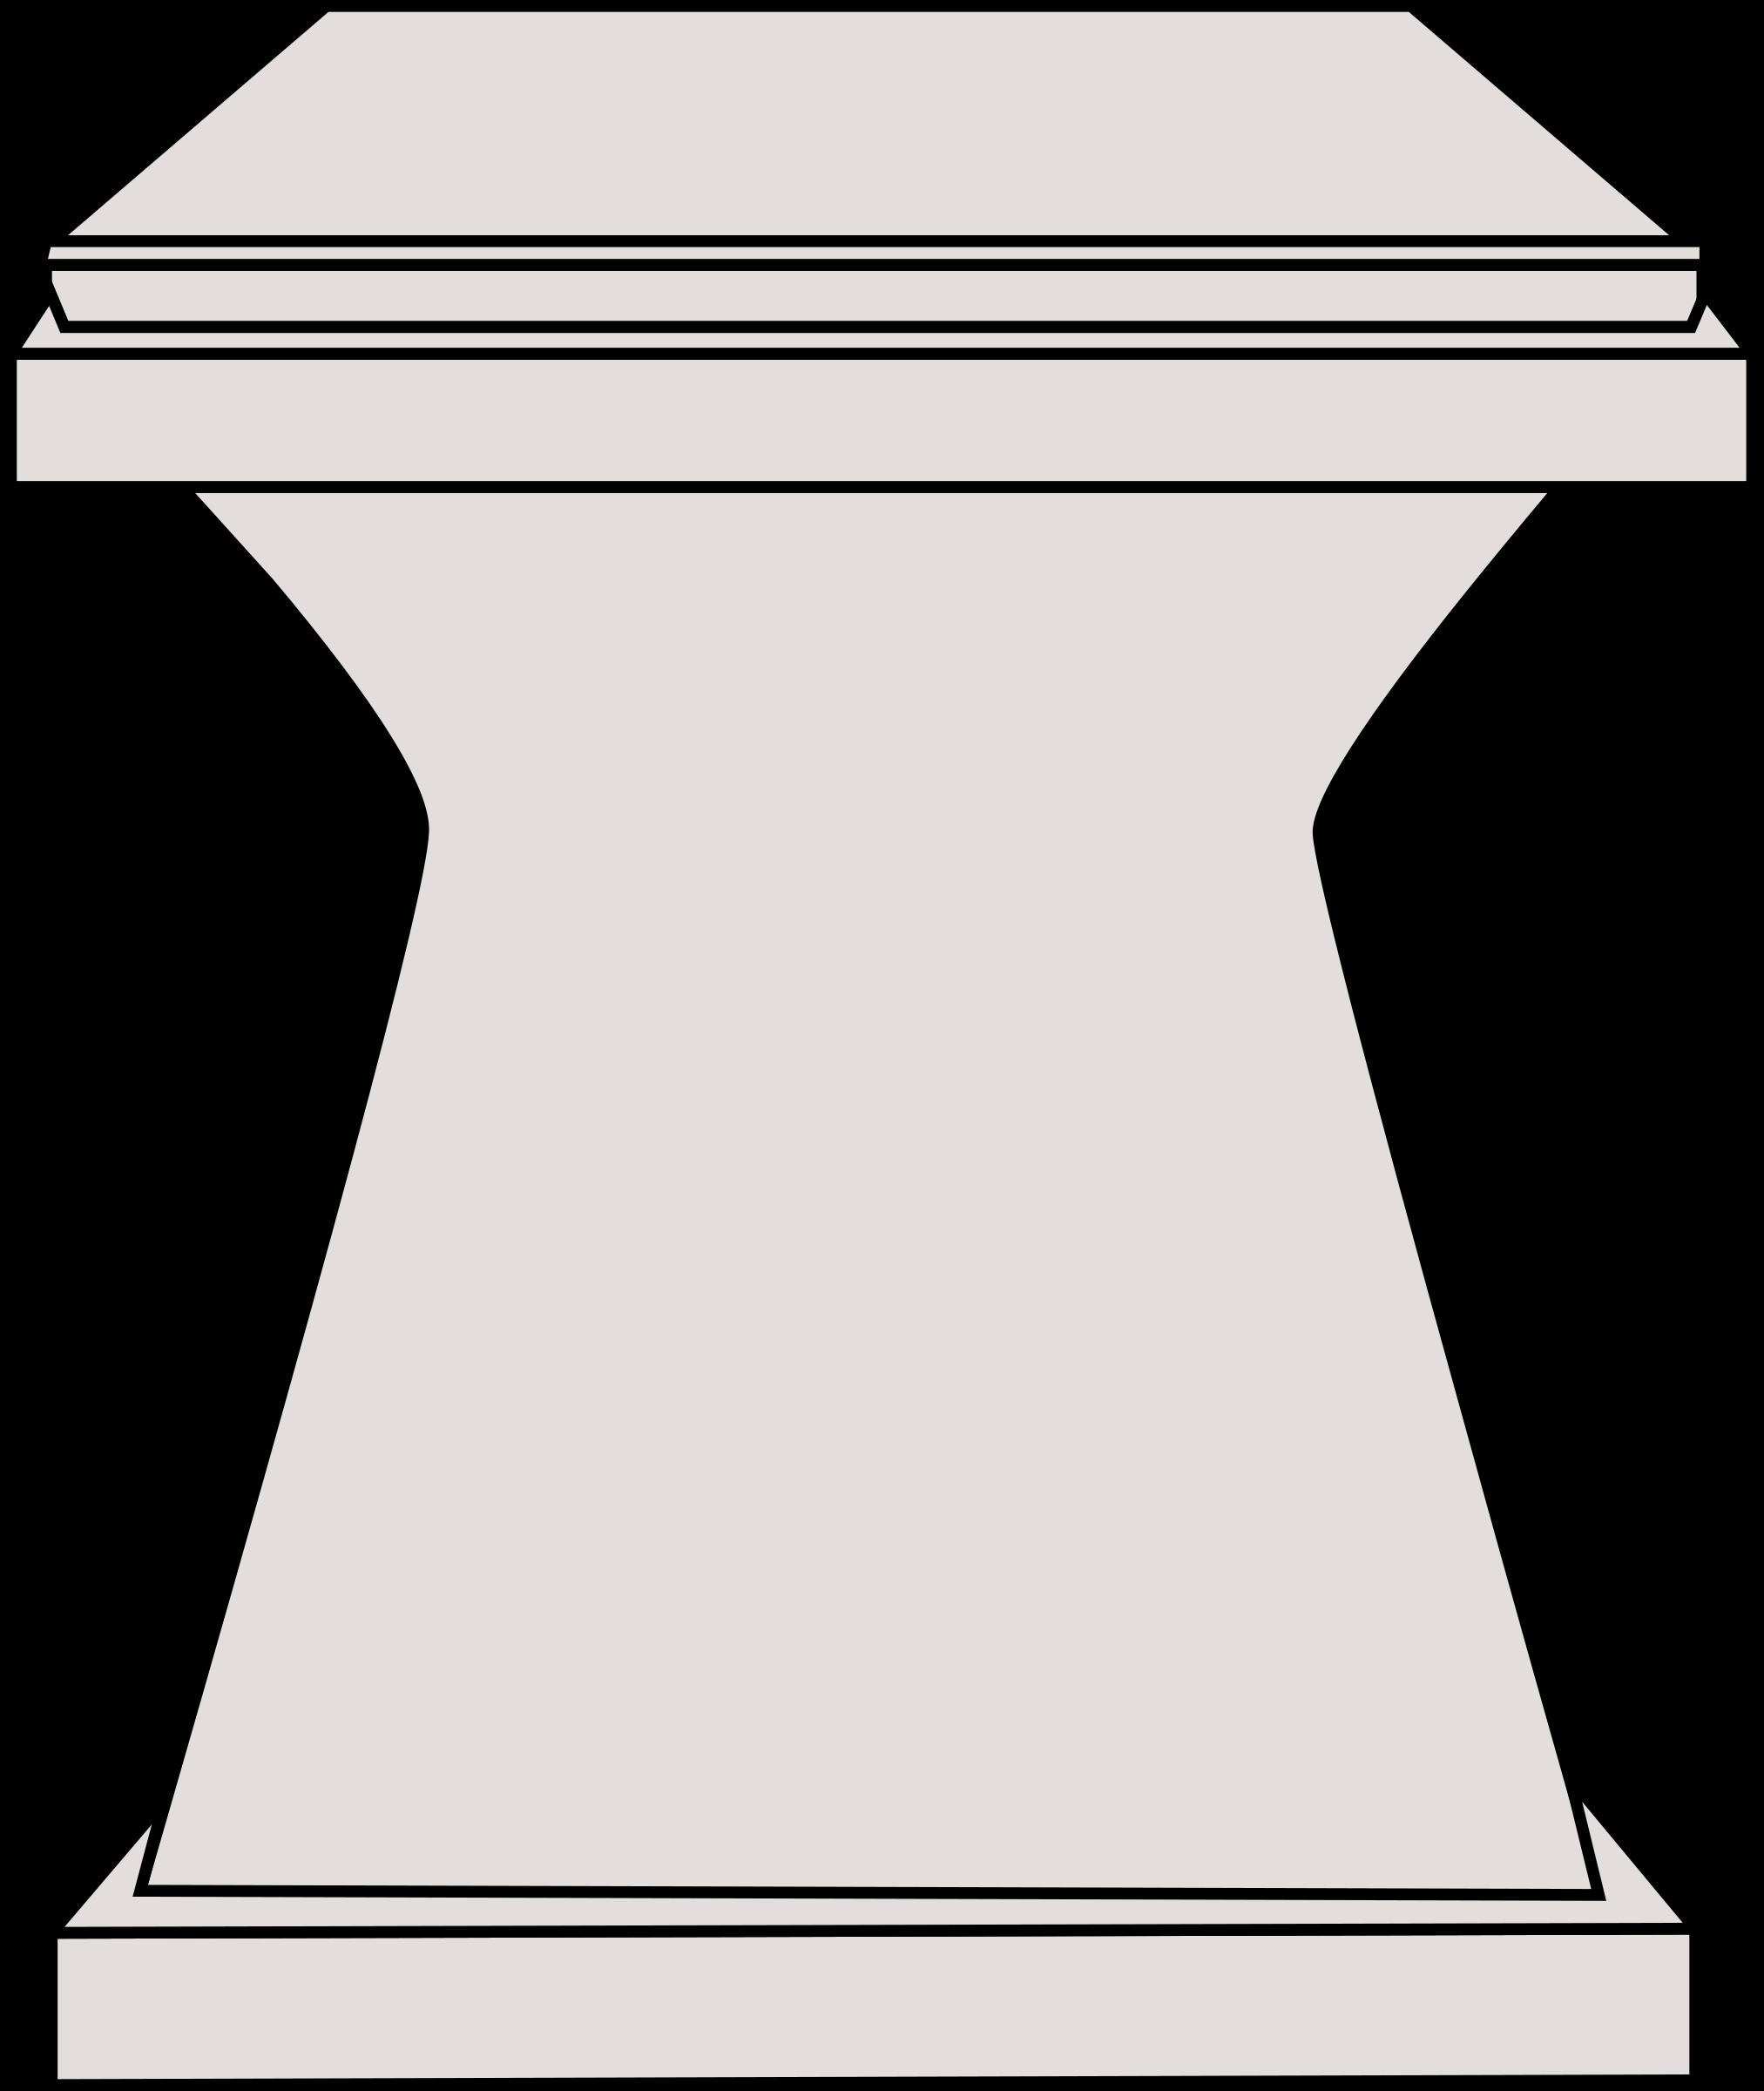 Big image png. Podium clipart pedestal